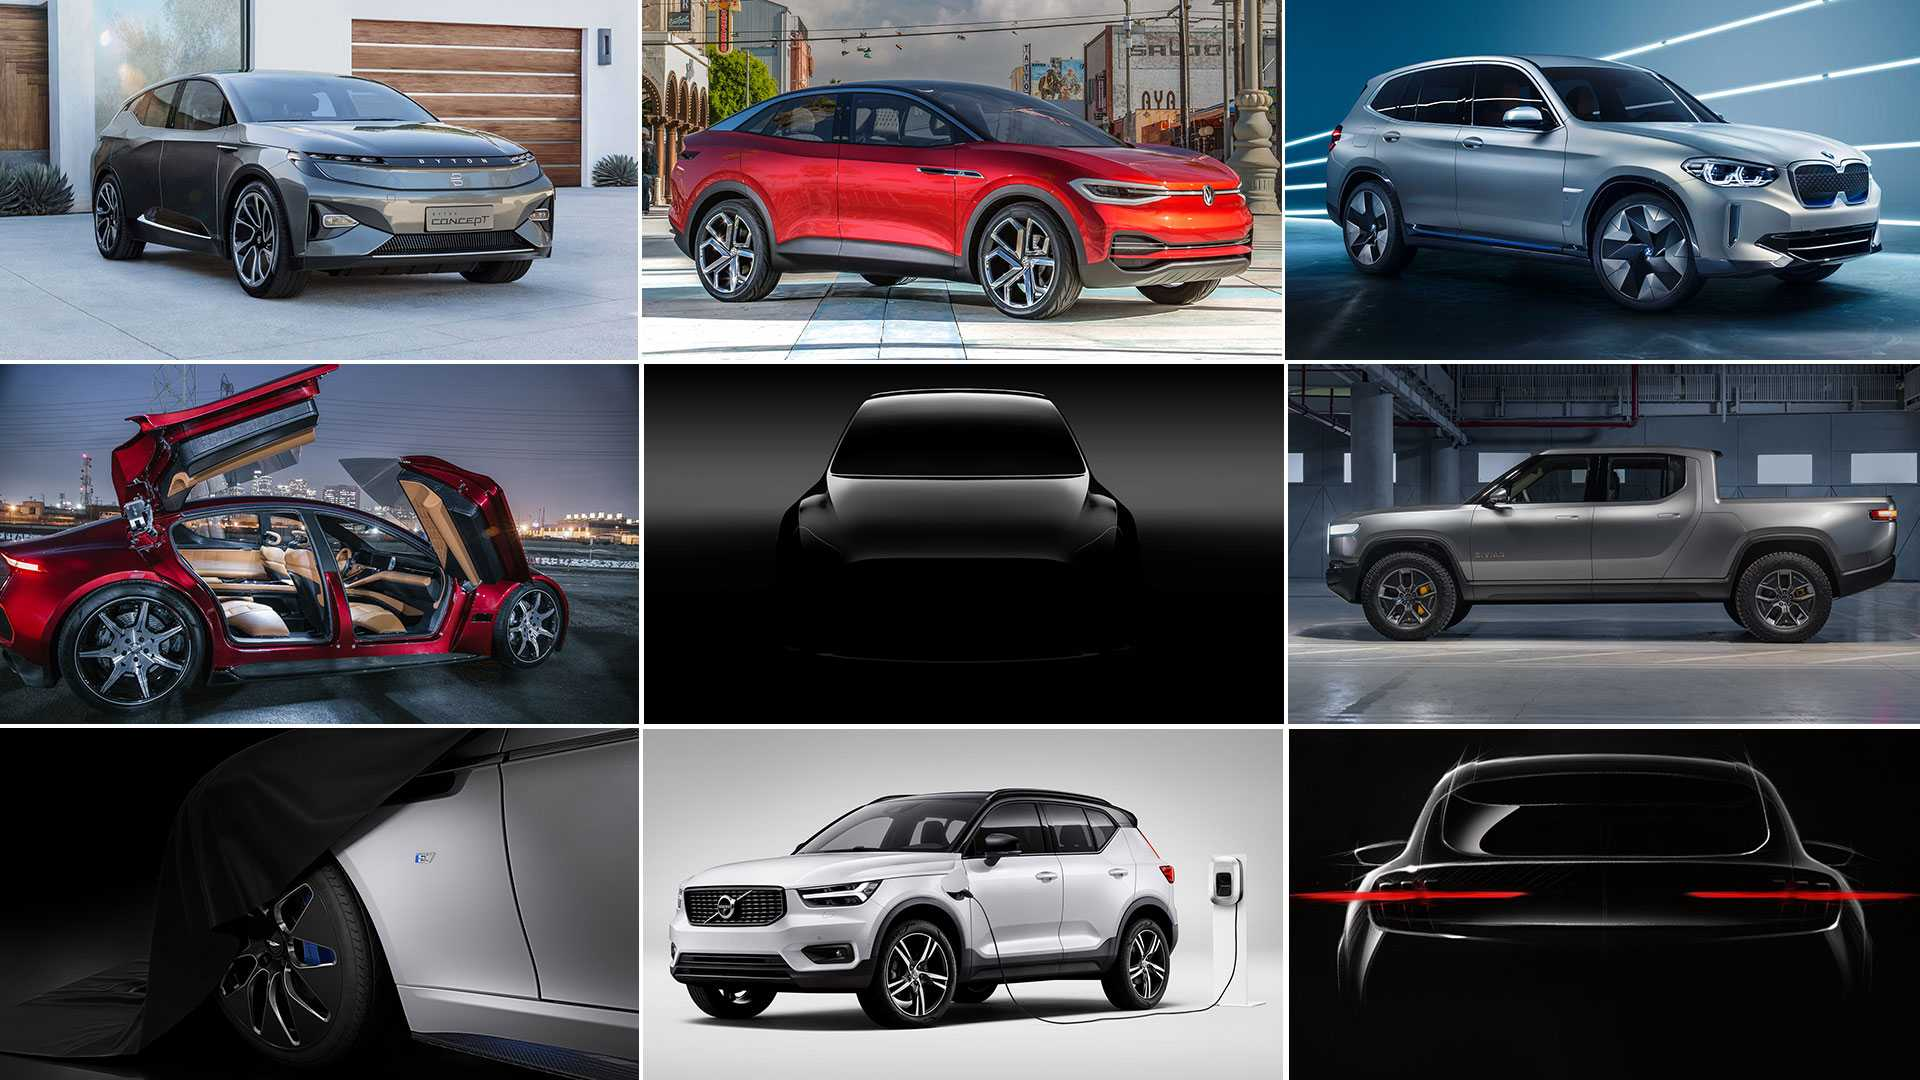 New Tesla Audi Volkswagen Ev Launches Due In 2020 Noodoe Ev Smart Electric Vehicle Charging Solutions